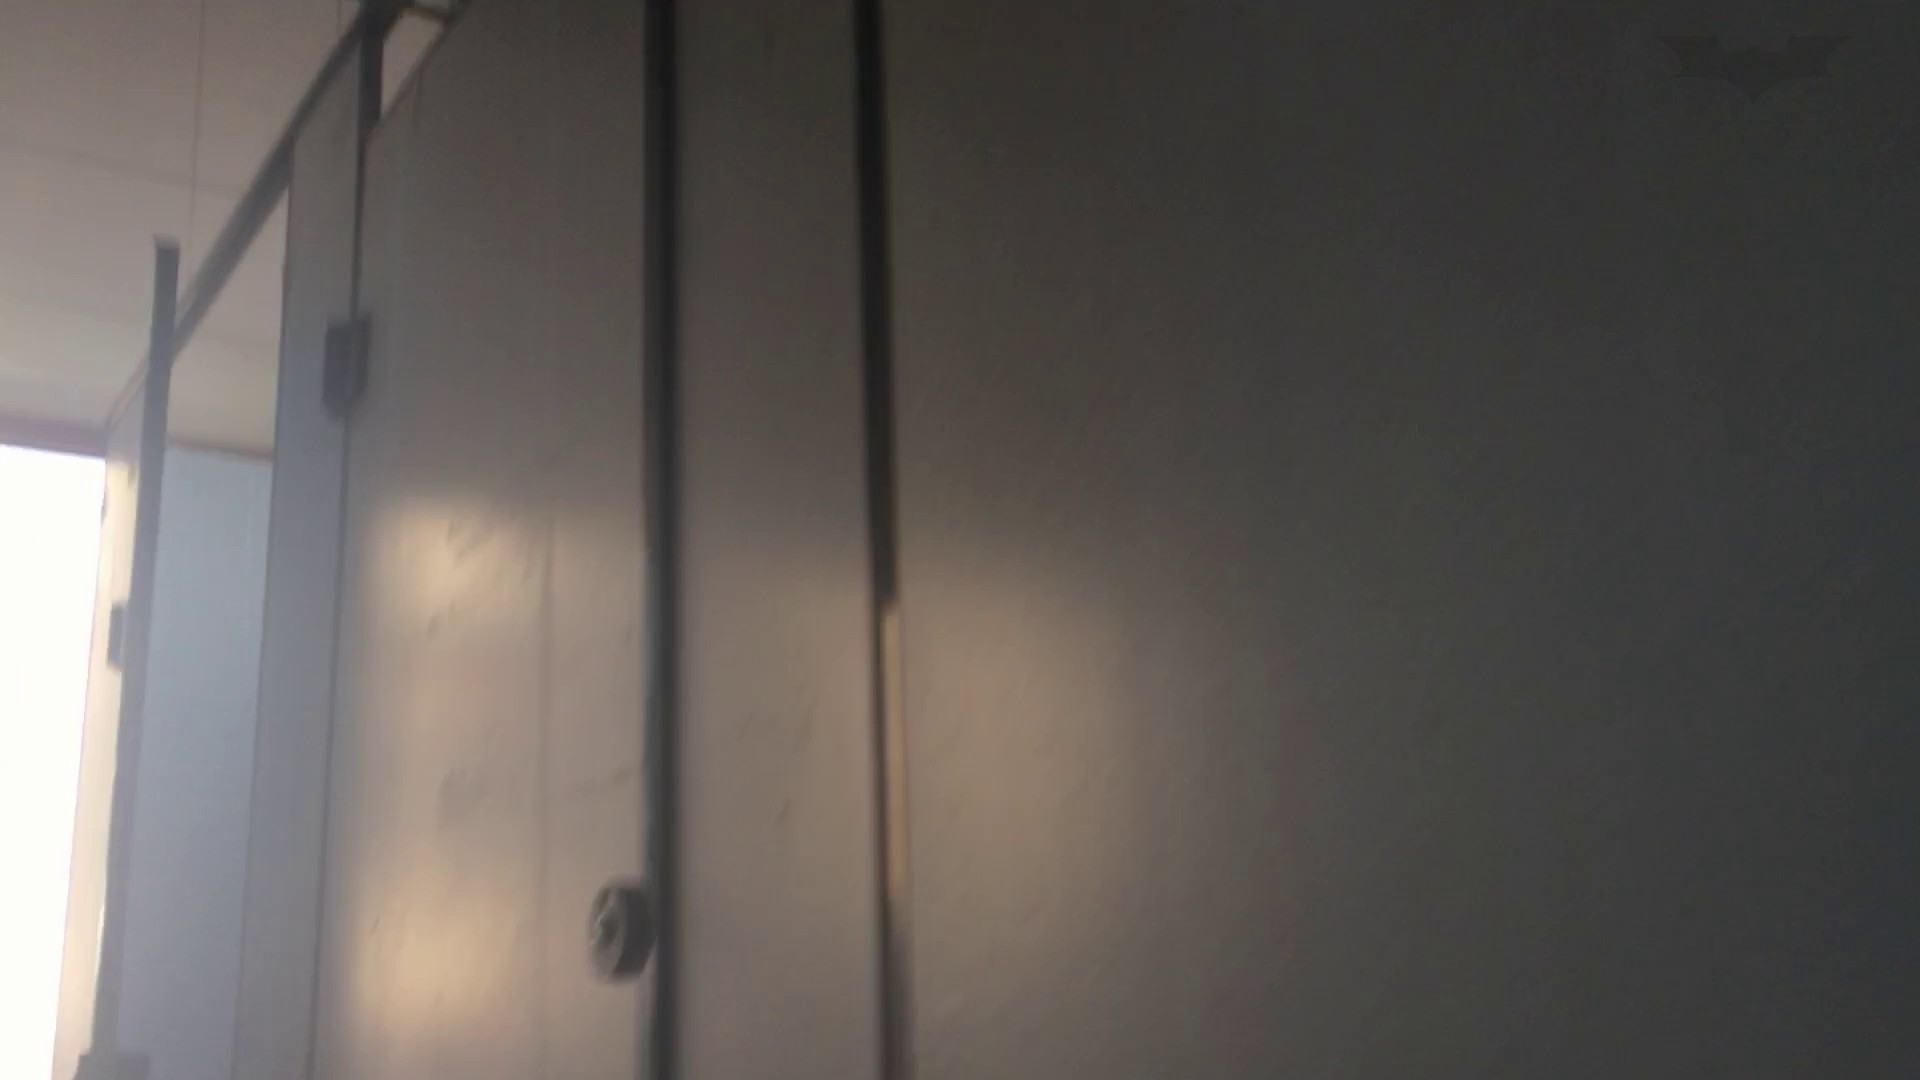 芸術大学ガチ潜入盗撮 JD盗撮 美女の洗面所の秘密 Vol.81 潜入 オマンコ無修正動画無料 100枚 71